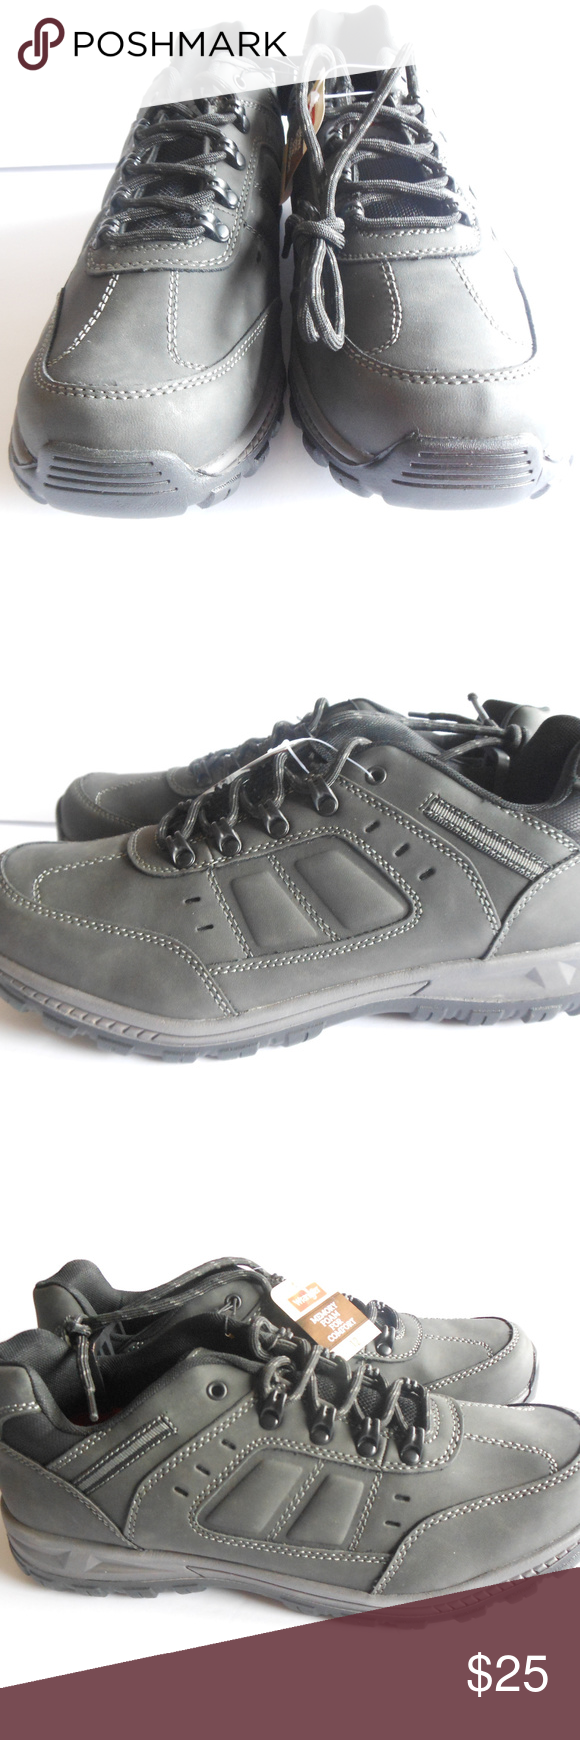 3a726d29 Men's Wrangler Rugged Oxford Shoes Men's Wrangler Rugged Oxford Shoes Sizes  10, 9.5 Memory Foam